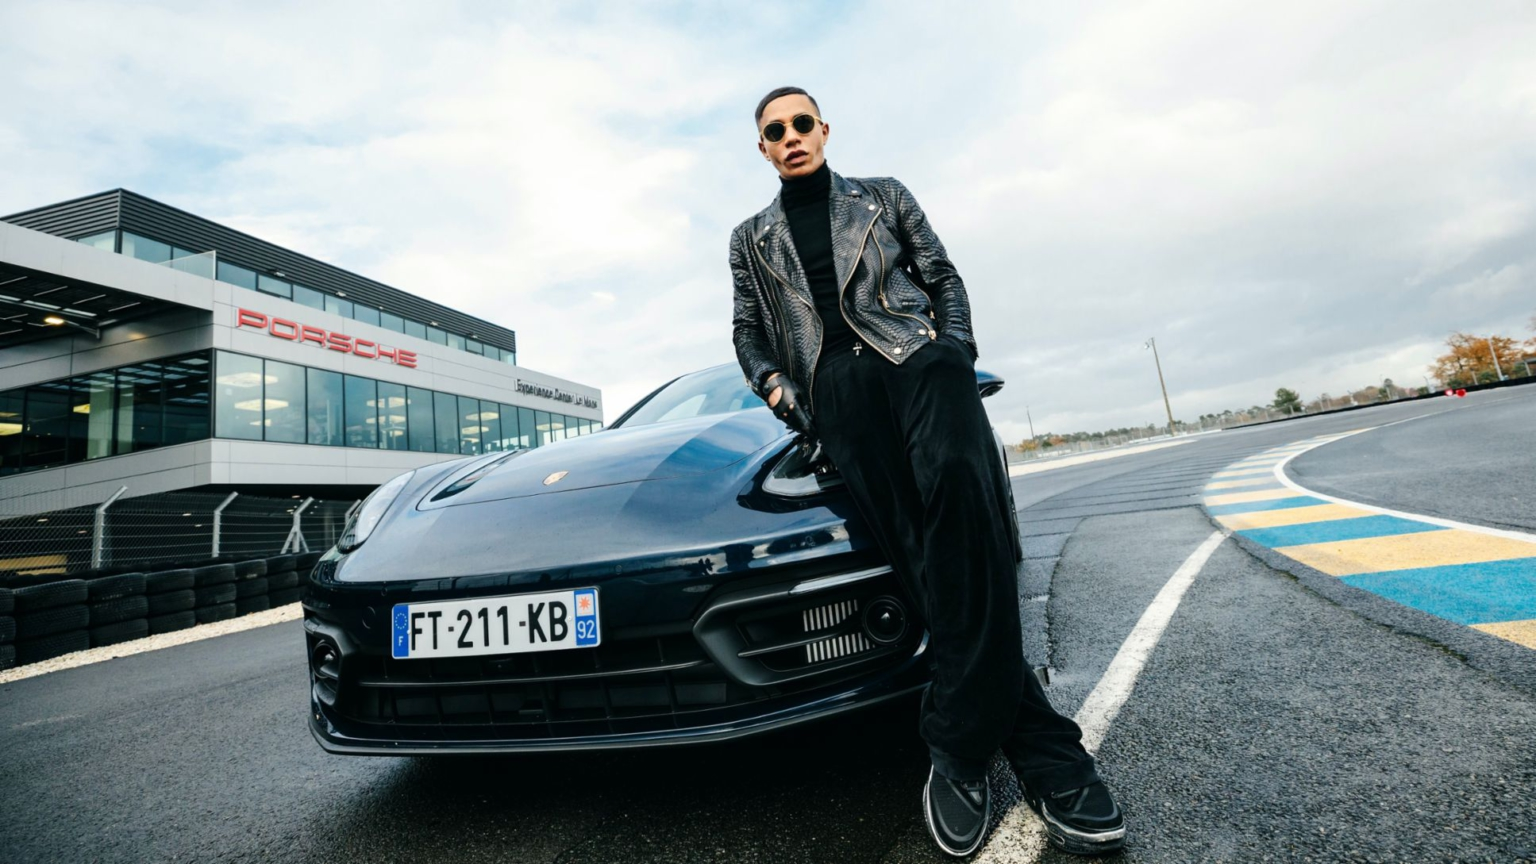 Porsche collaborates with Balmain's Creative Director Olivier Rousteing